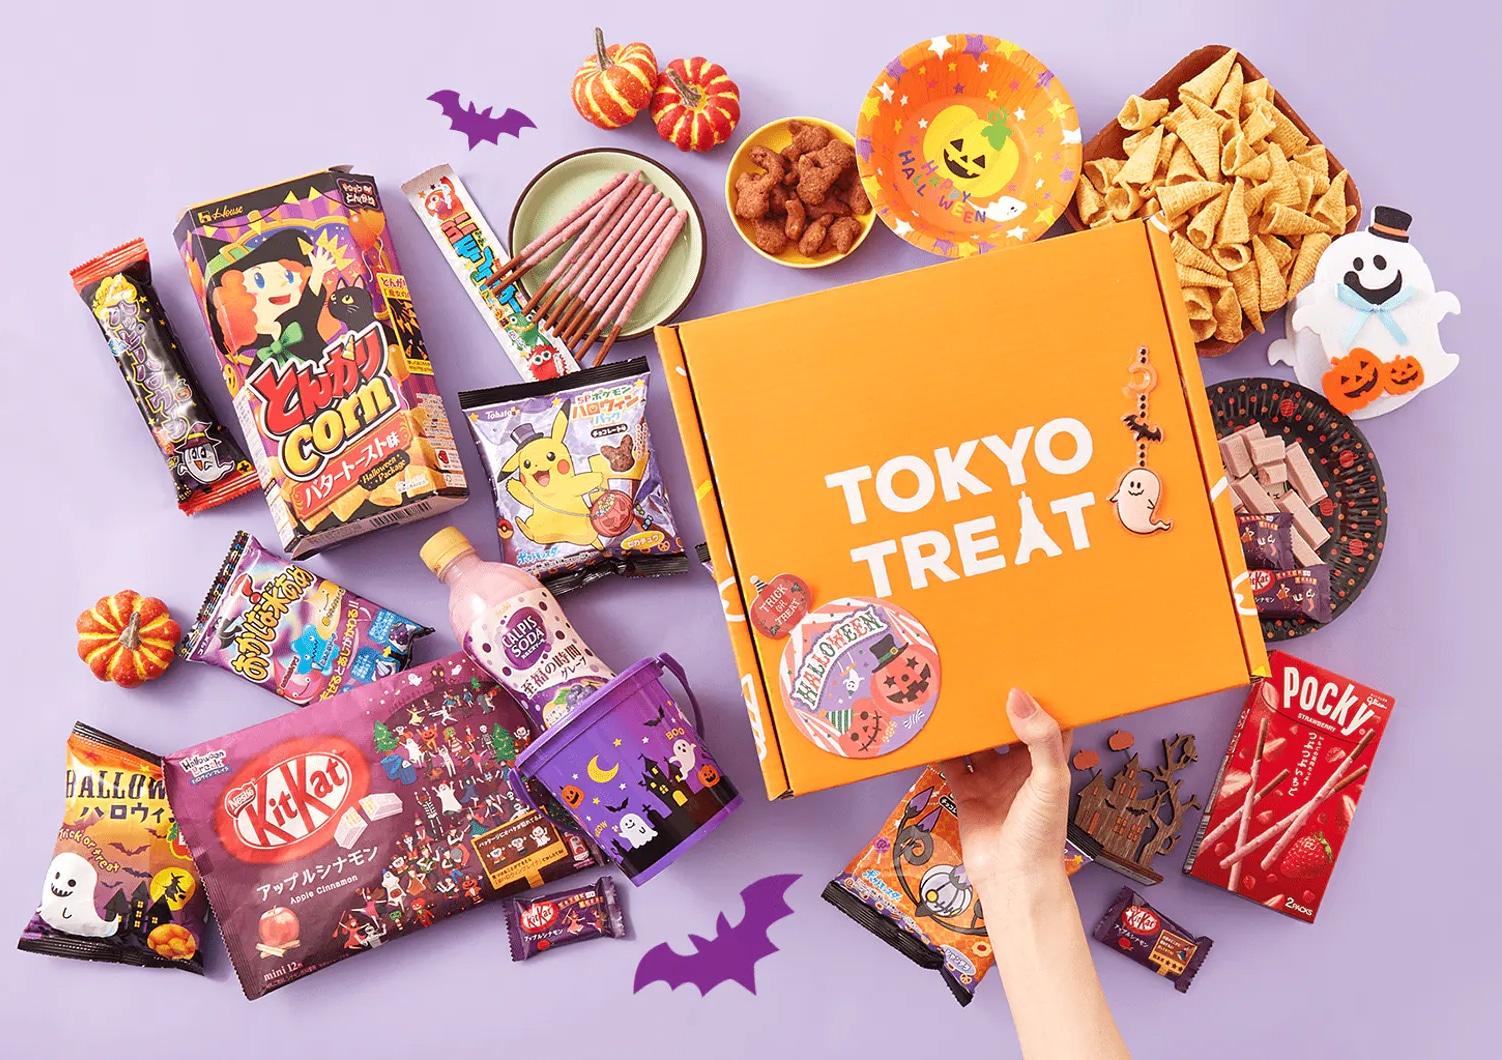 TokyoTreat reviews